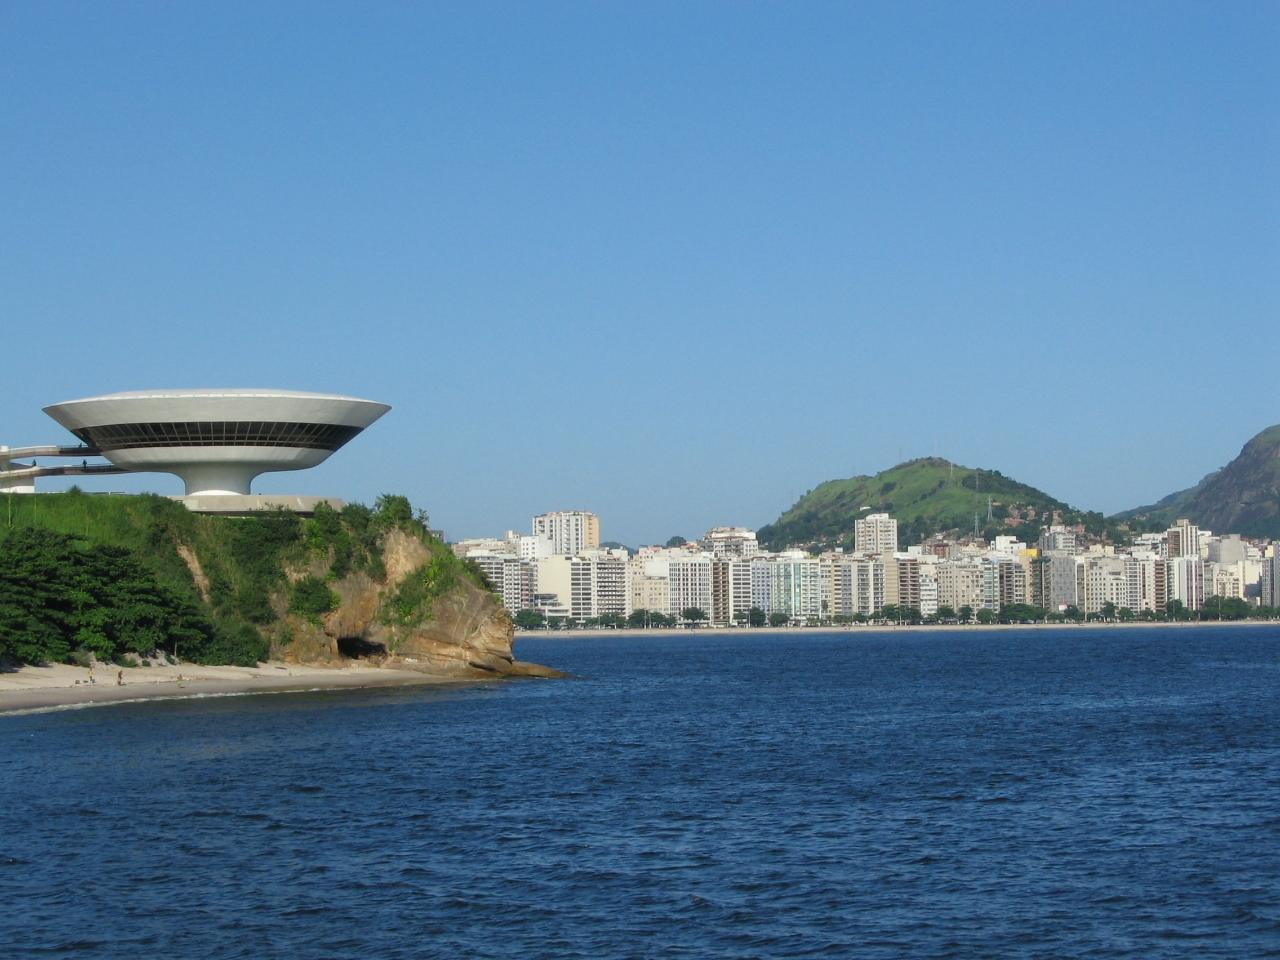 One Day in Niterói - Niemeyer Pathway, Contemporary Art Museum, Guanabara Bay Beaches, Santa Cruz Fort & Parque da Cidade - from Barra da Tijuca